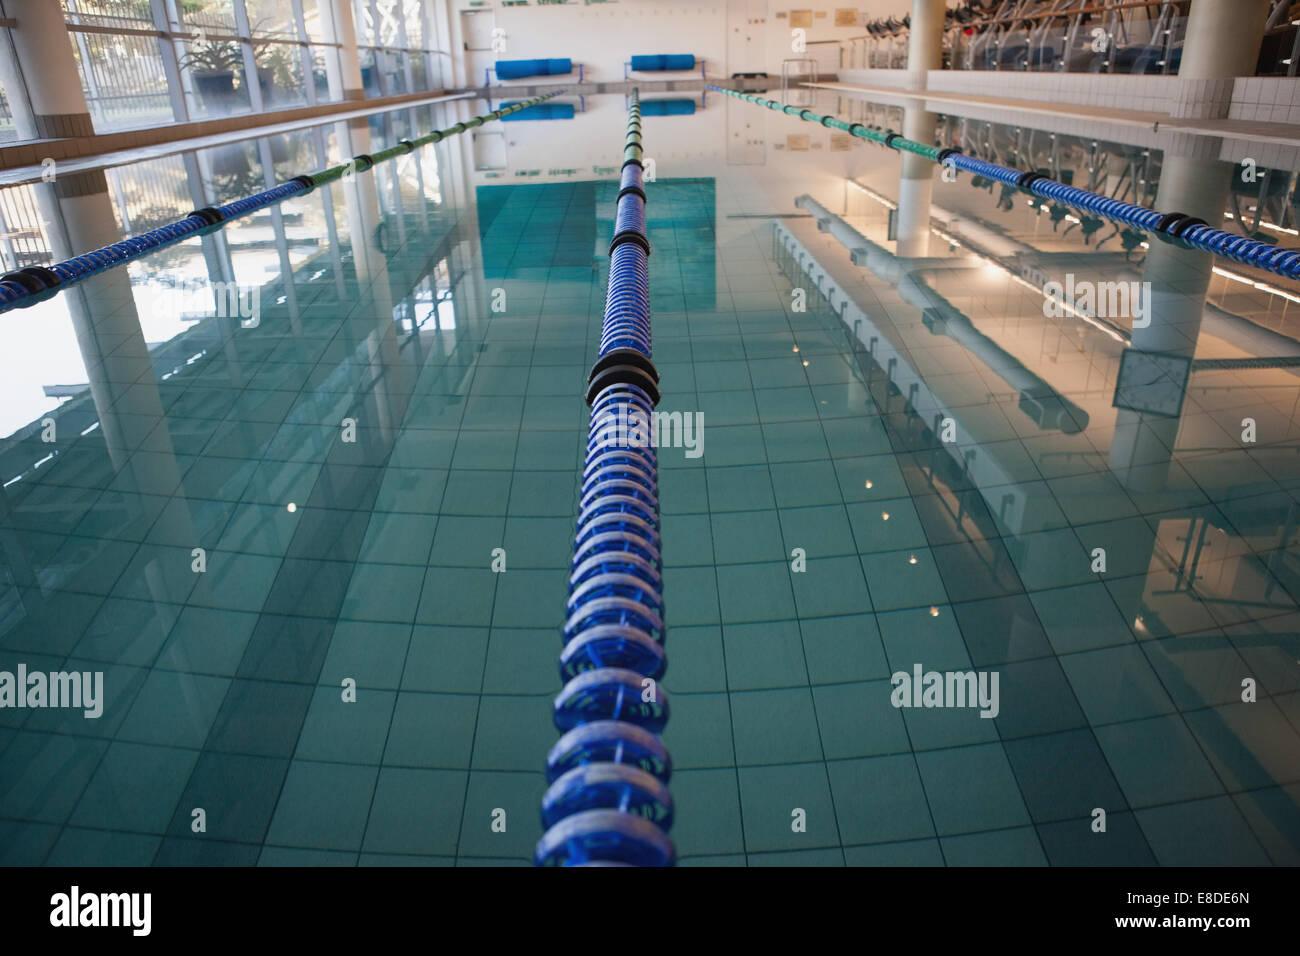 Swimming Pool Lane Markers Stock Photos Amp Swimming Pool